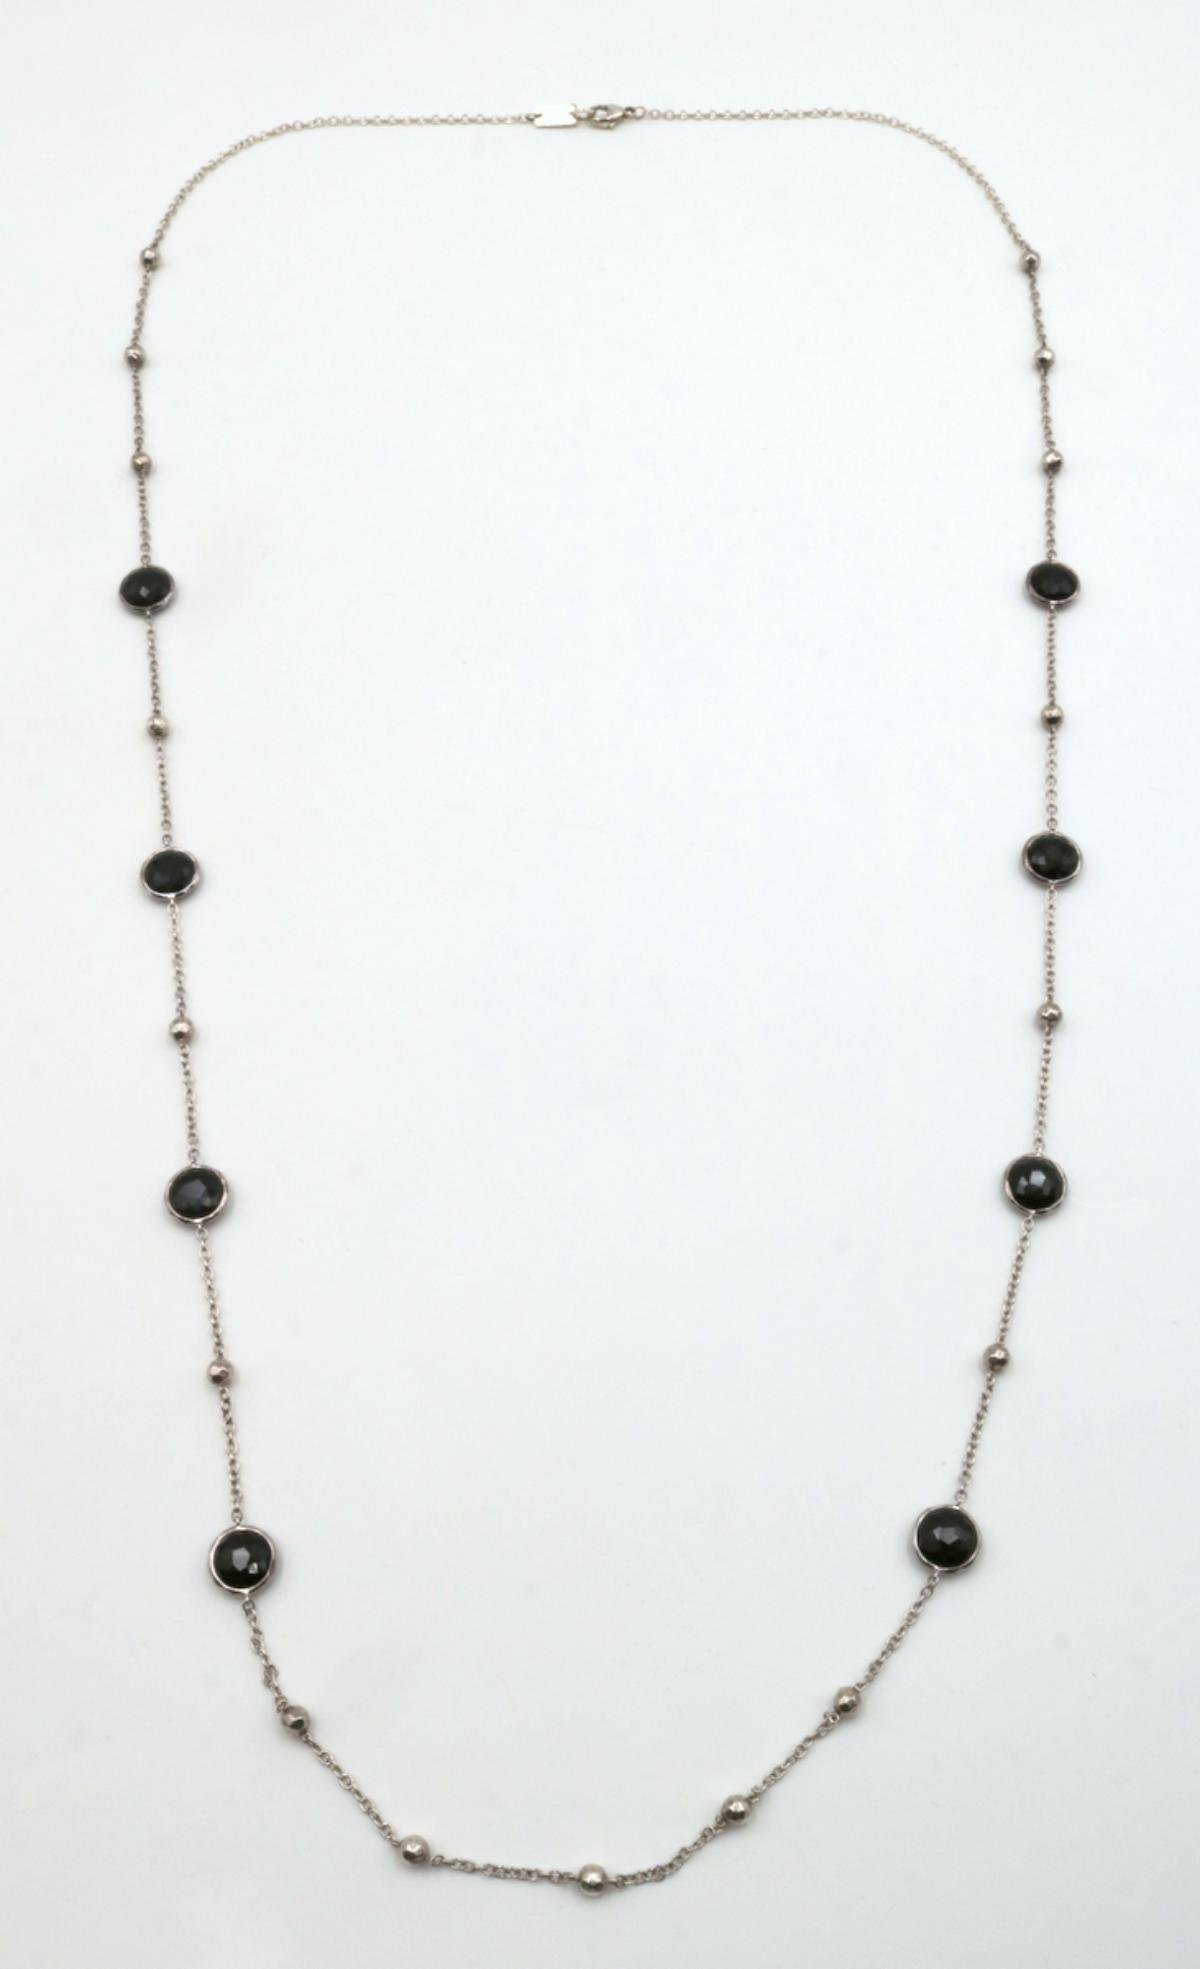 Ippolita Black Onyx & Sterling Necklace